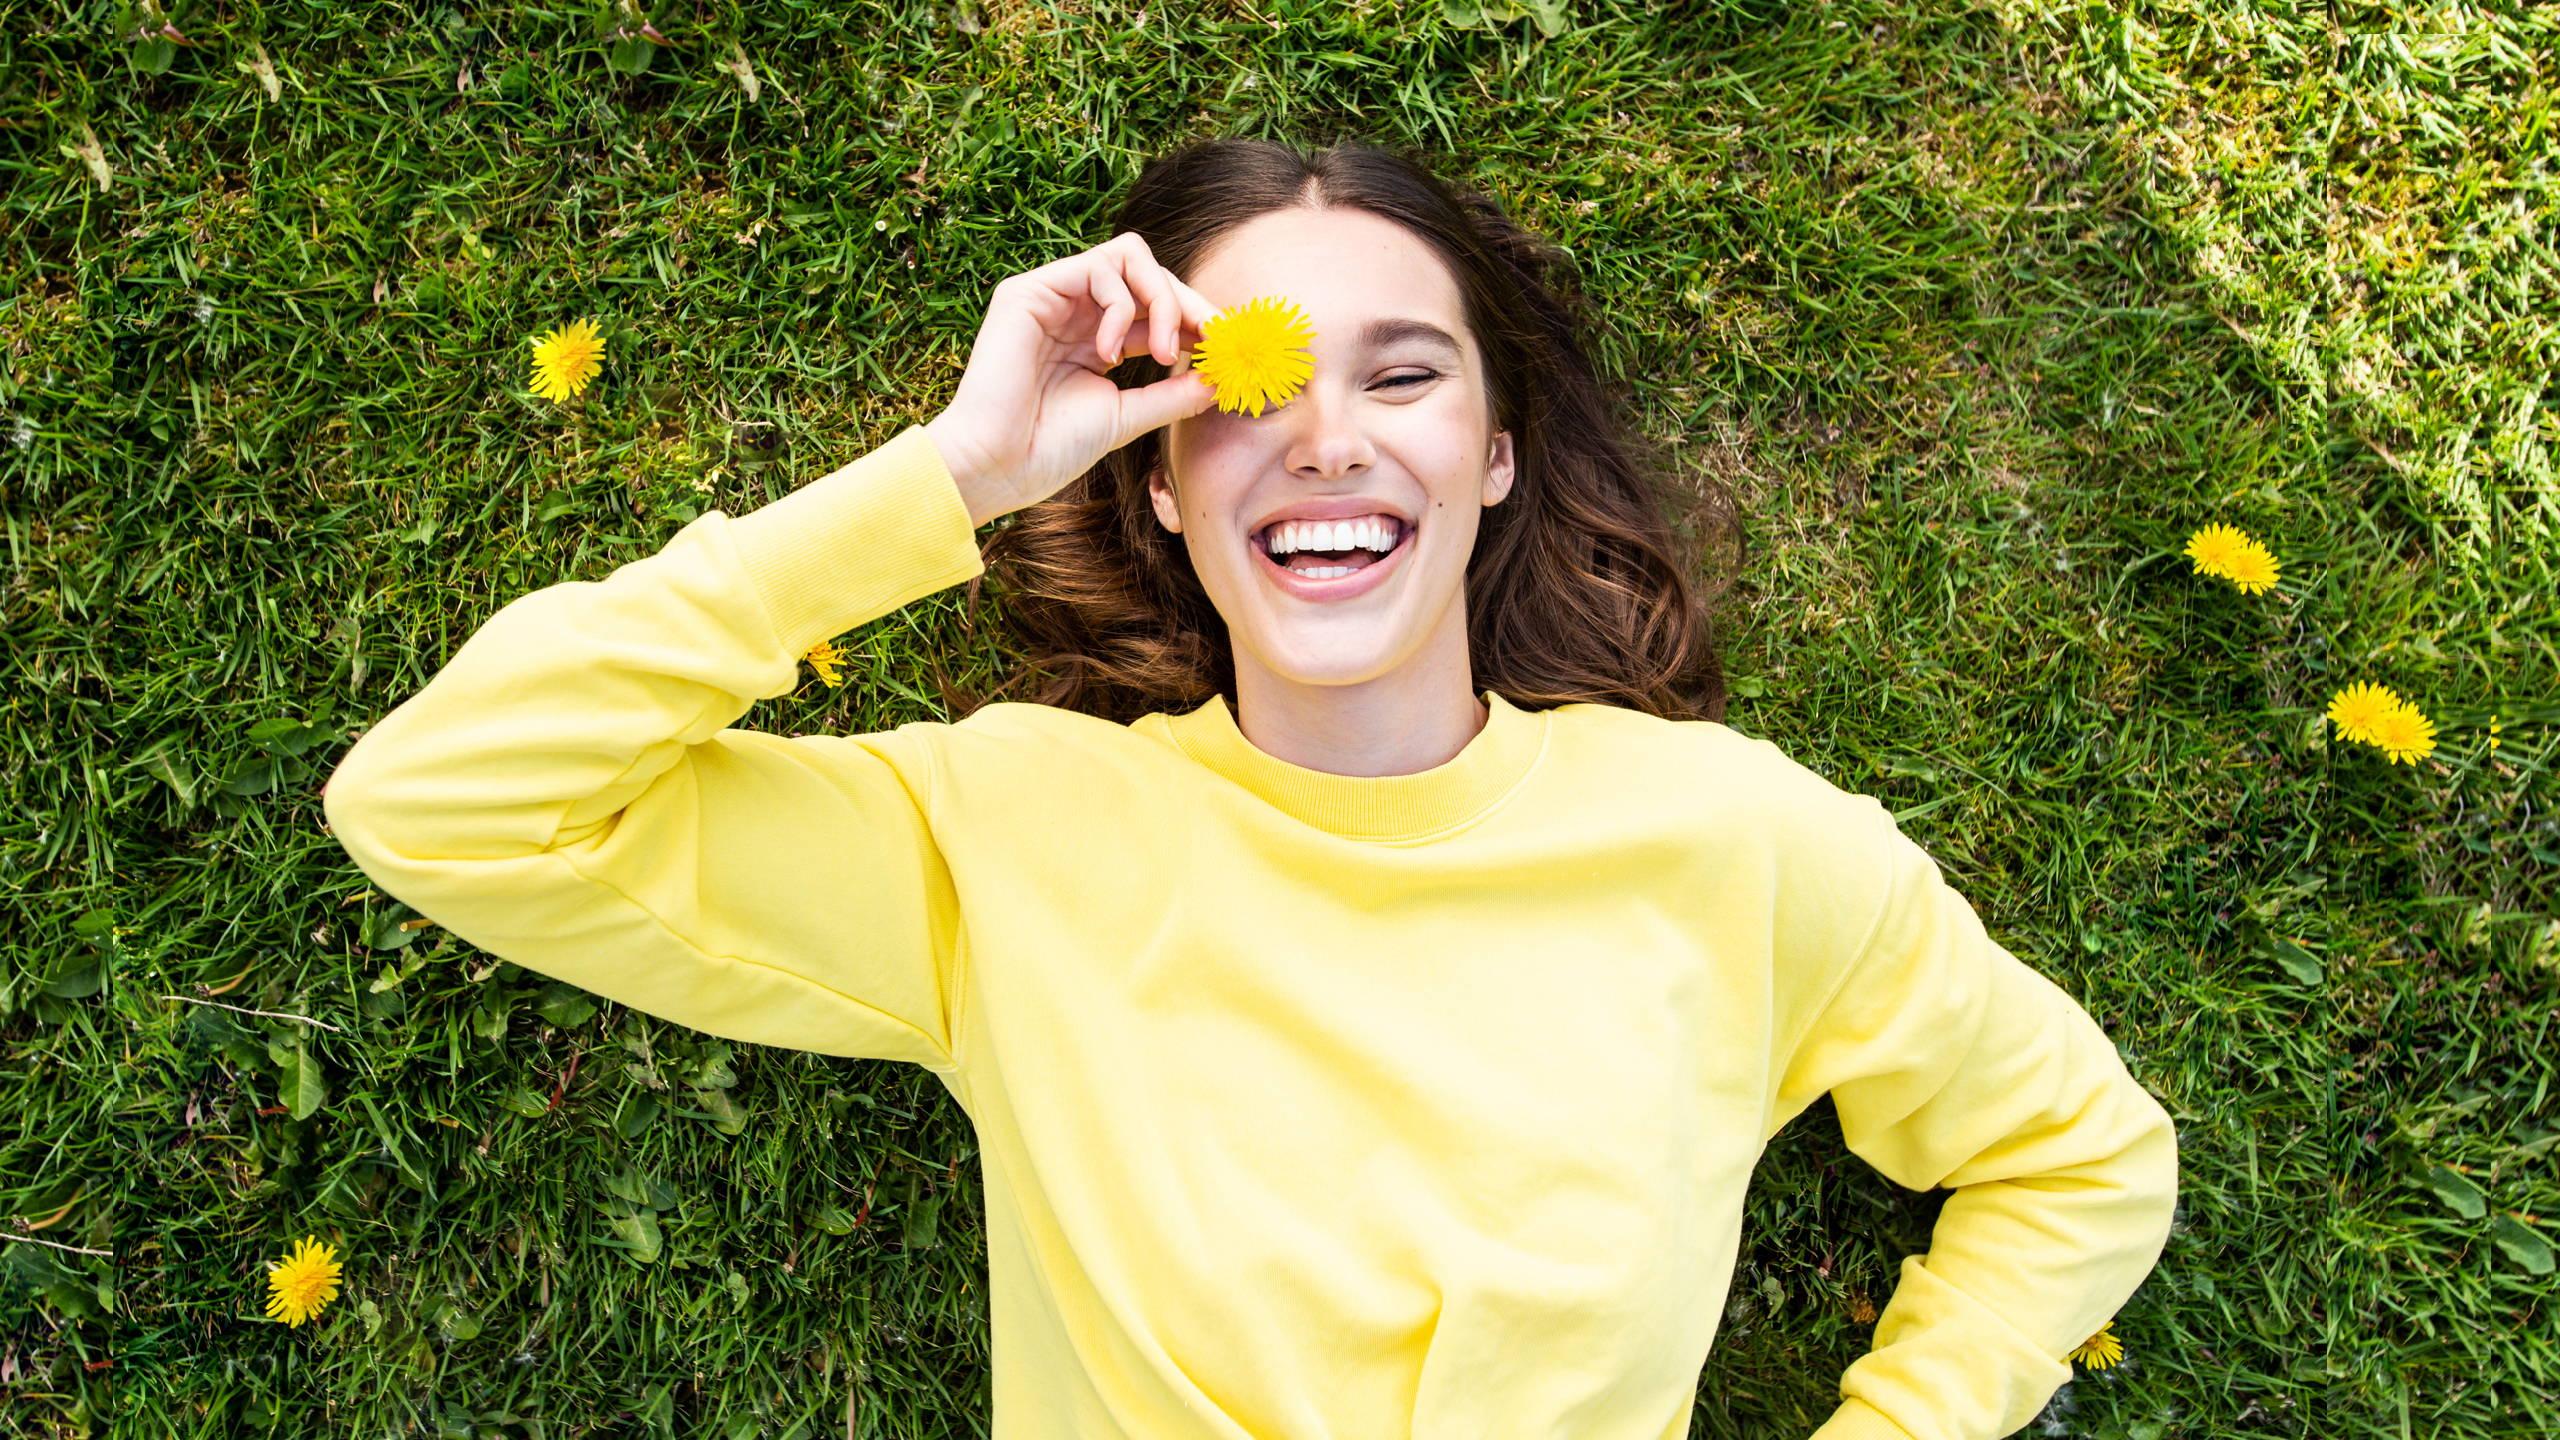 Women laying in grass wearing yellow sweater